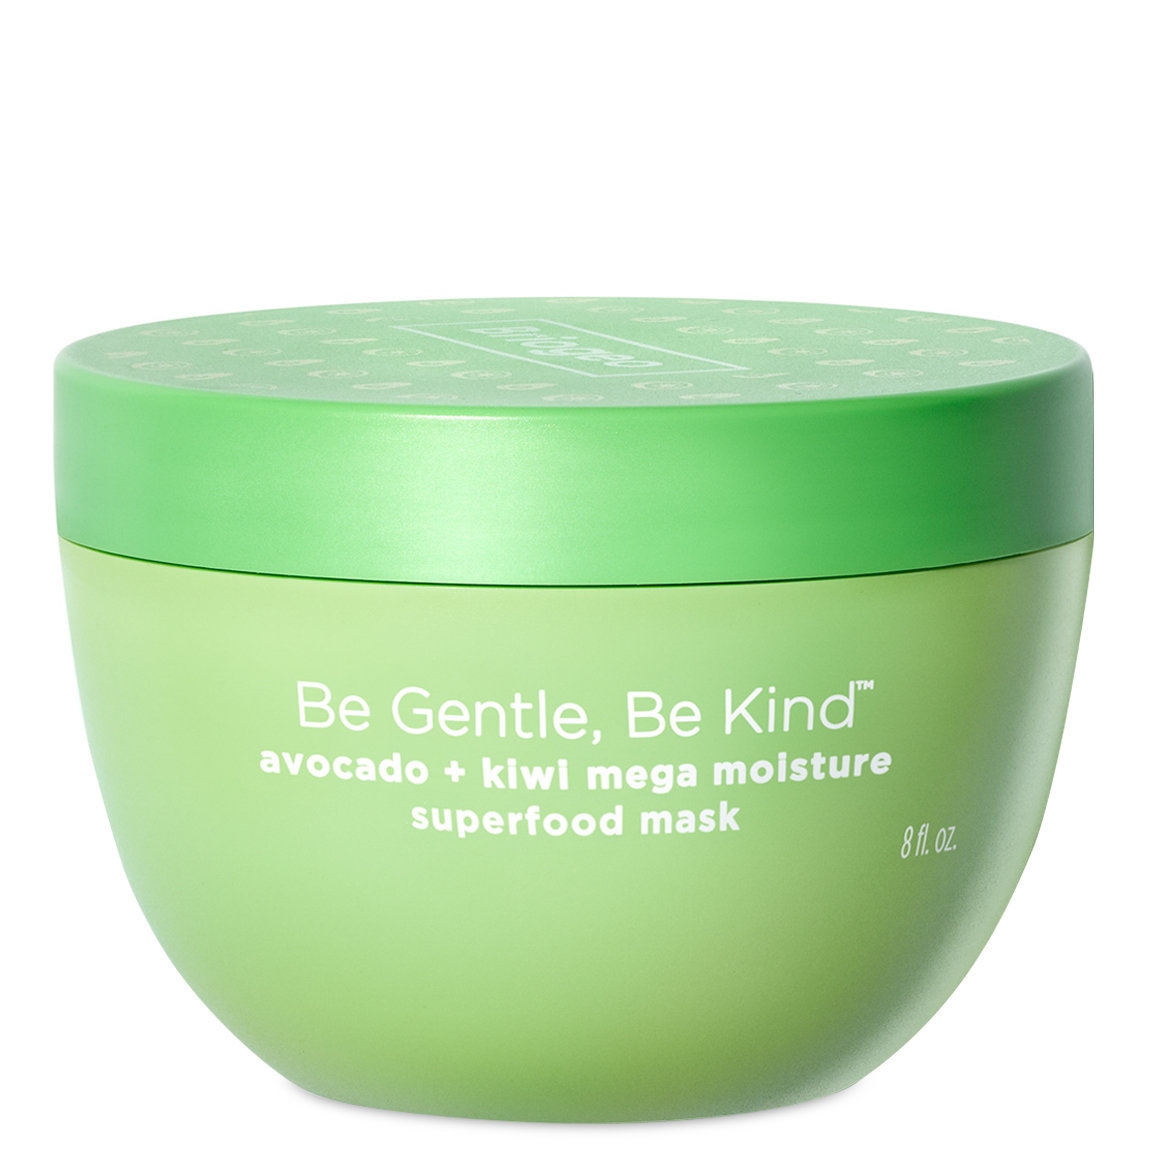 Briogeo Be Gentle, Be Kind Avocado + Kiwi Mega Moisture Superfood Mask alternative view 1 - product swatch.